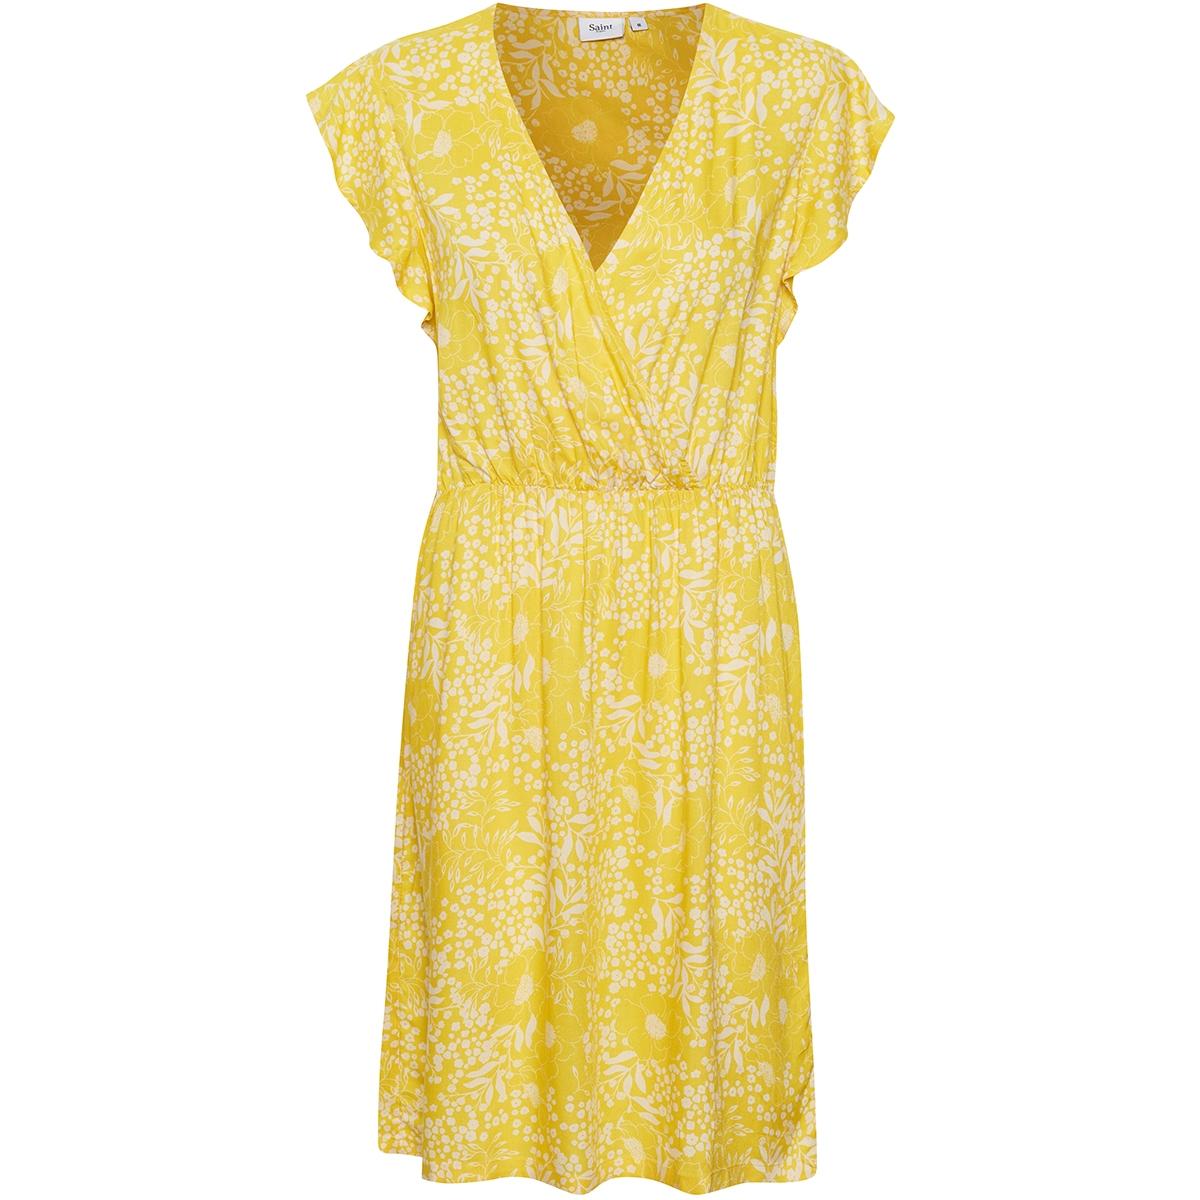 tishasz dress 30510242 saint tropez jurk 600003